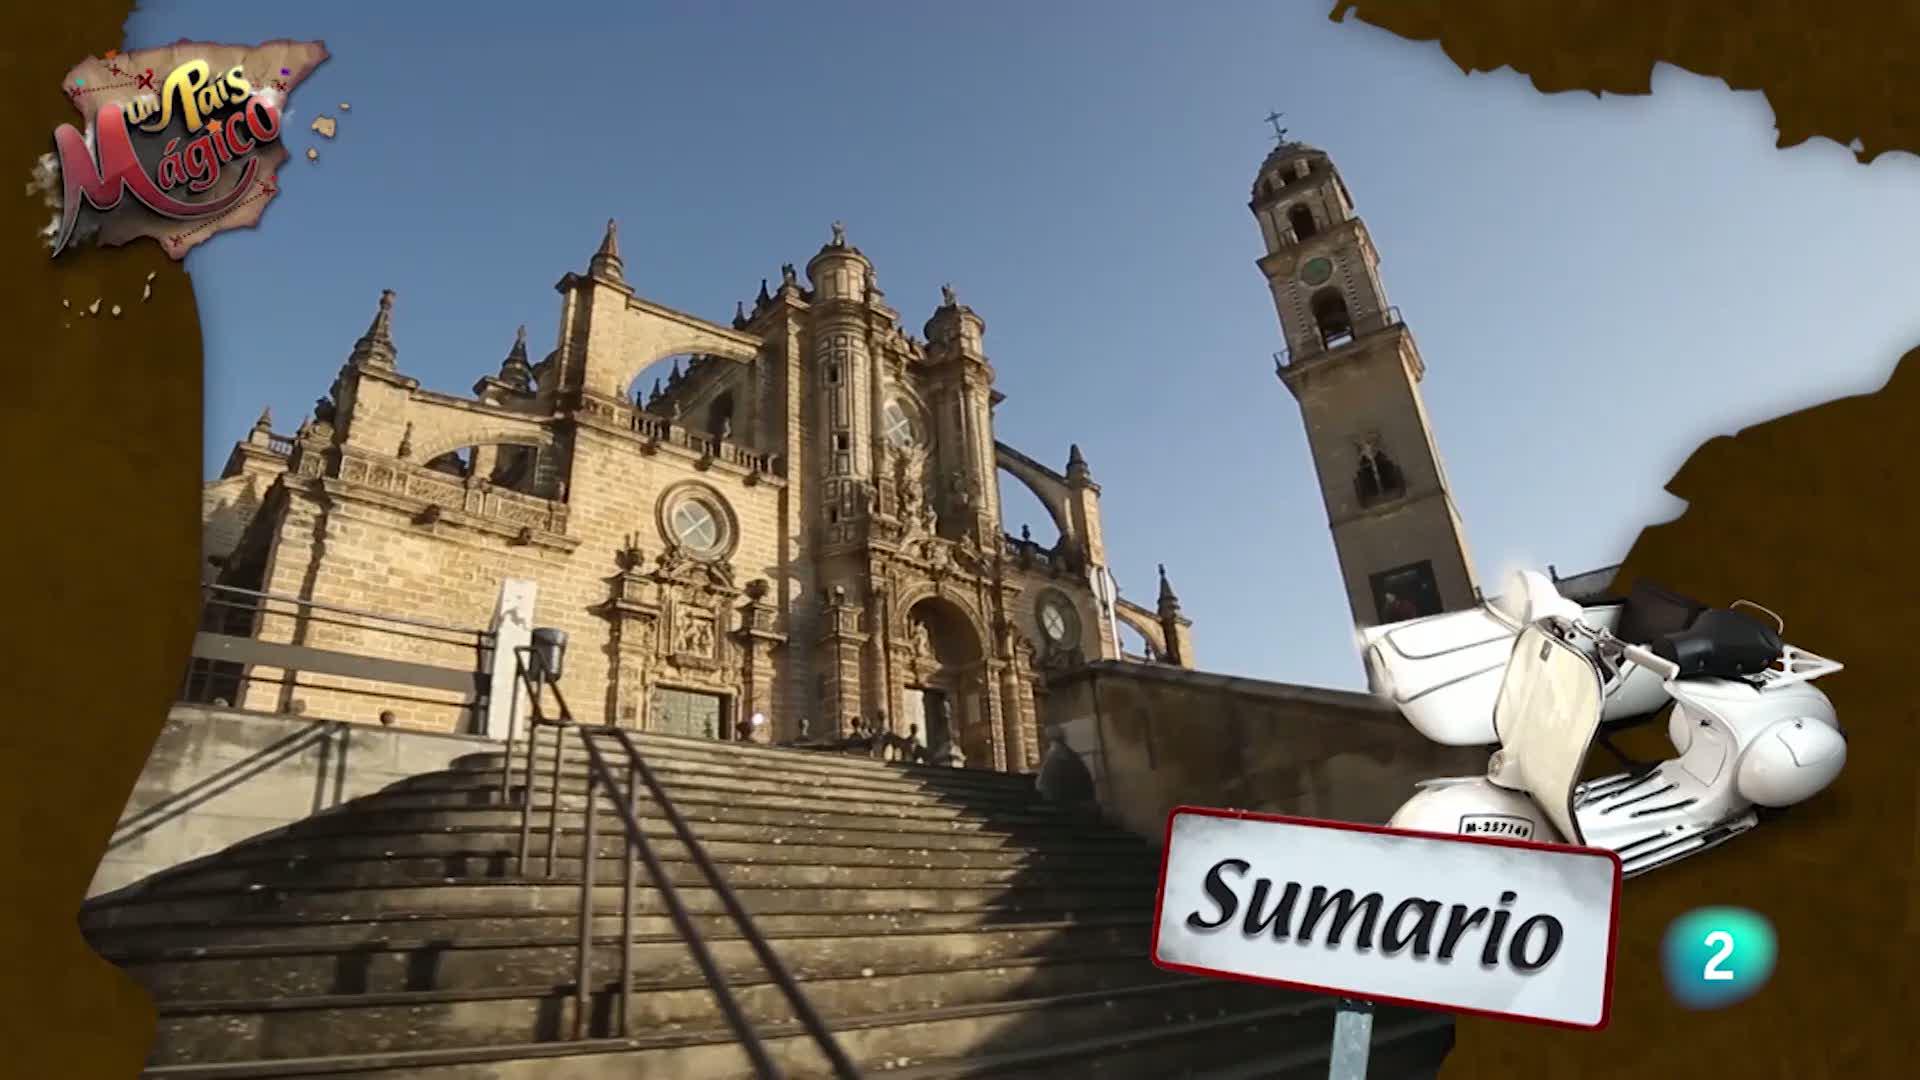 Un país mágico - Cádiz y Sevilla - avance